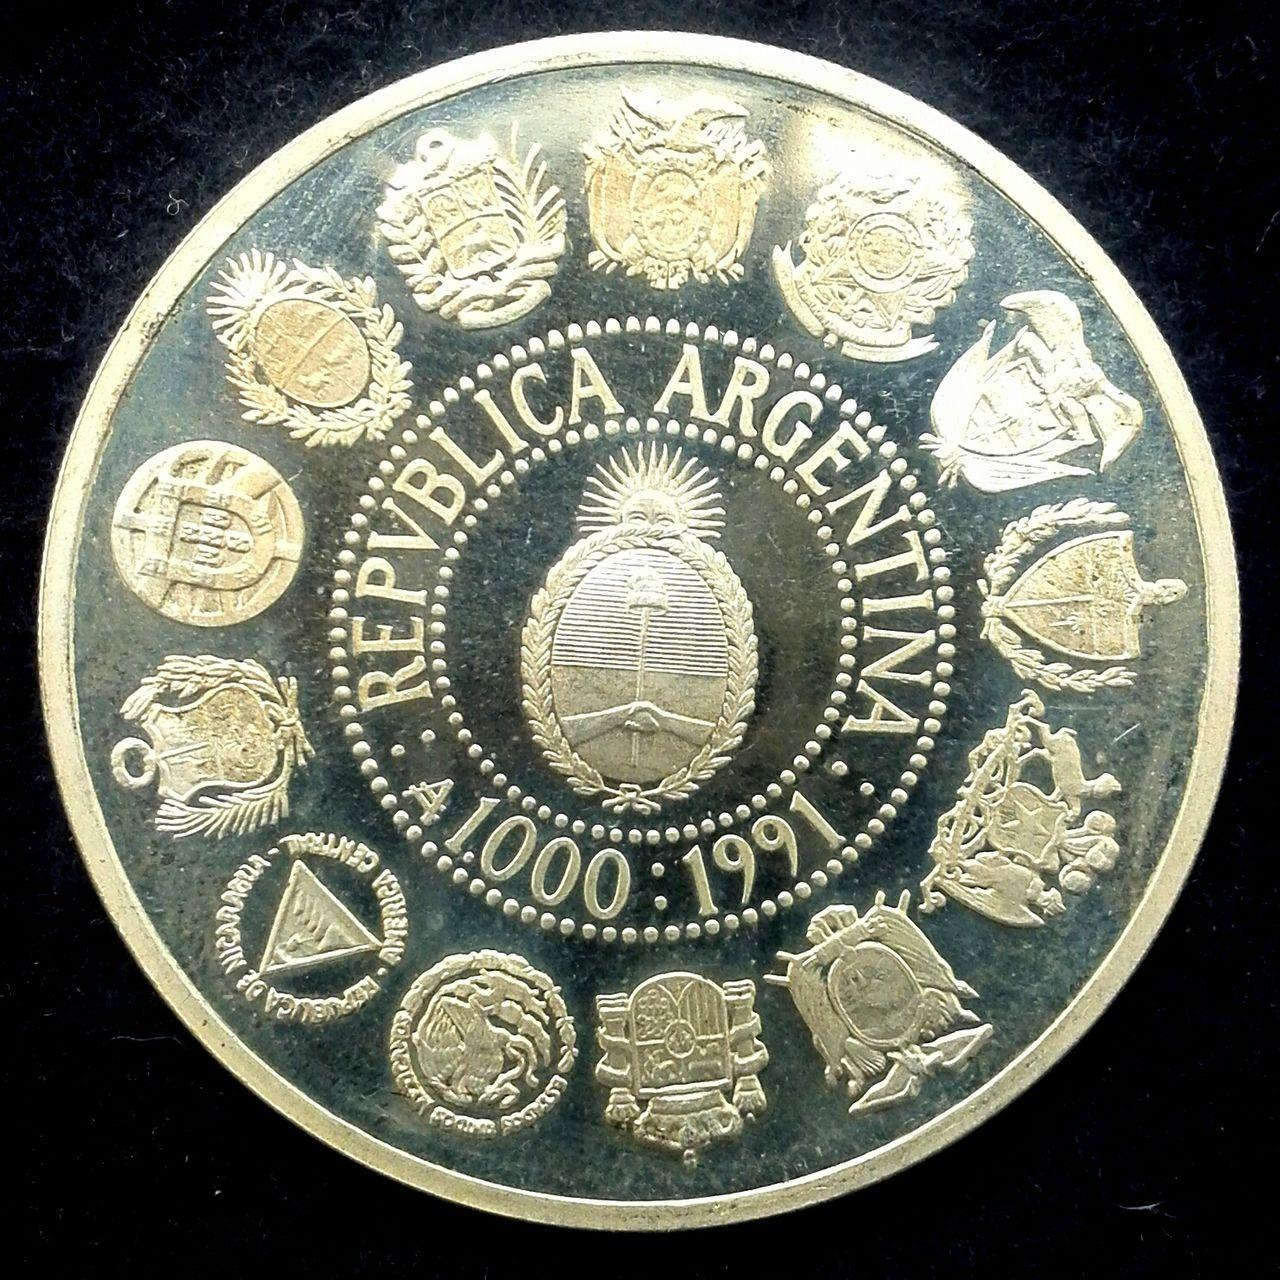 Argentina - 1000 australes - 1991 - I Serie Iberoamericana - Dedicada a Flekyangel IMG_20140602_100855